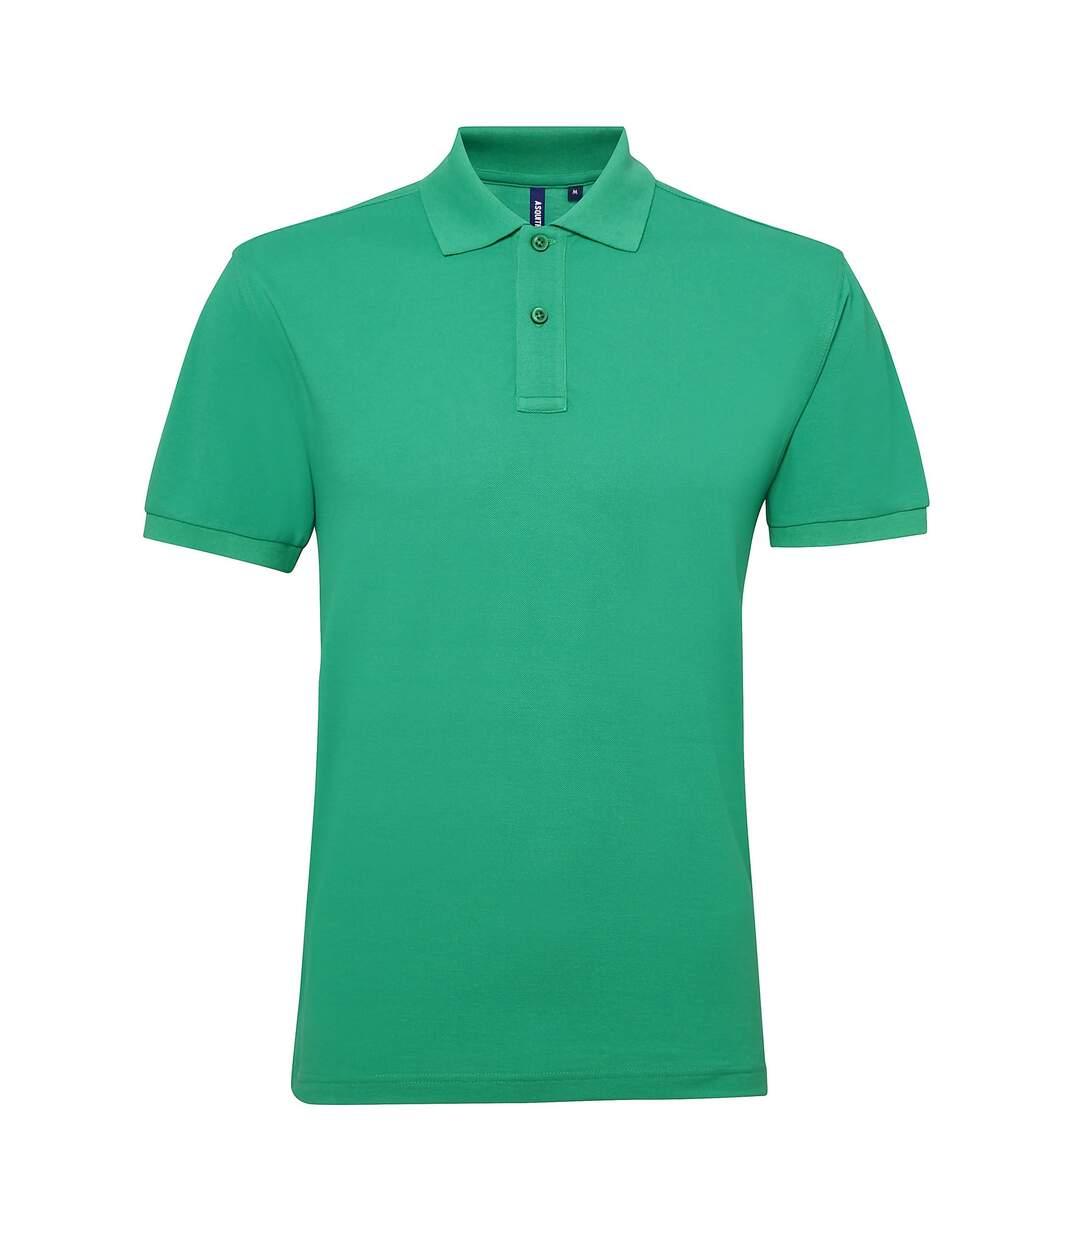 Asquith & Fox Mens Short Sleeve Performance Blend Polo Shirt (Kelly) - UTRW5350